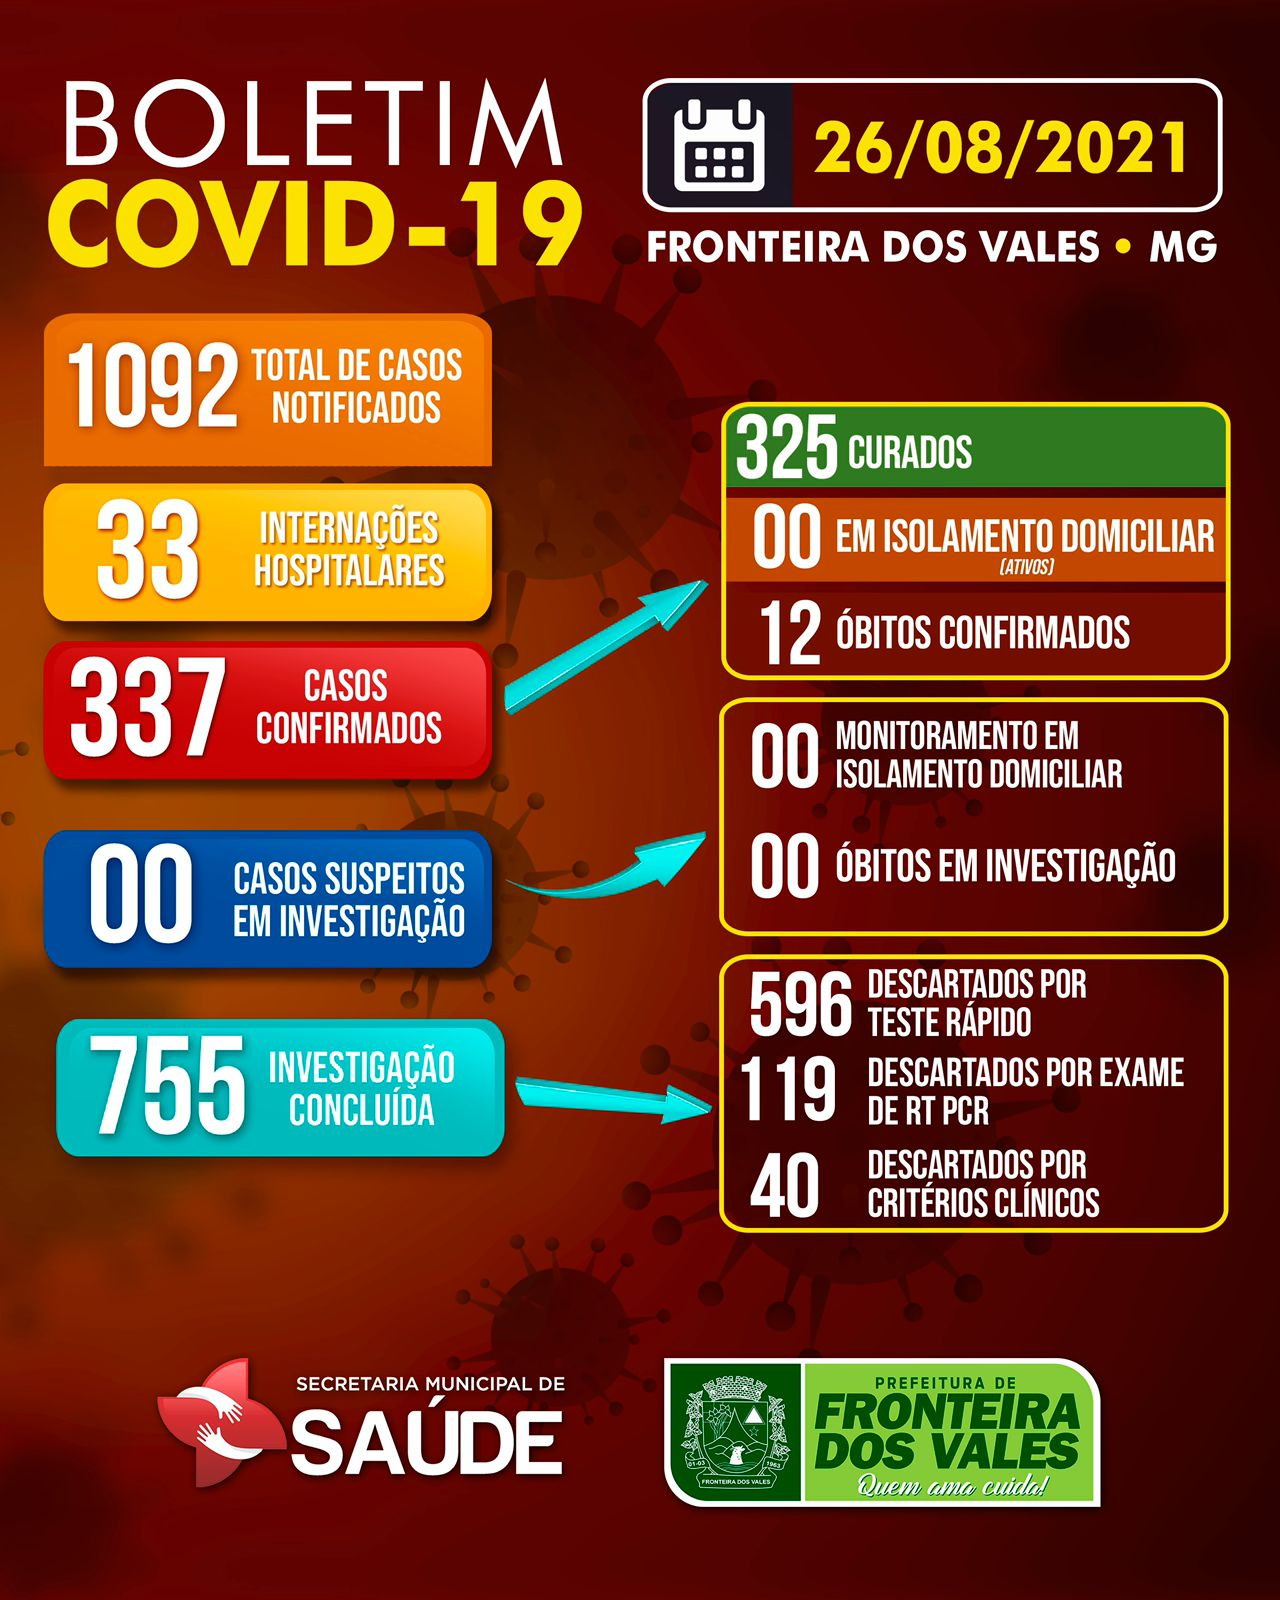 BOLETIM COVID-19 - 26/08/2021